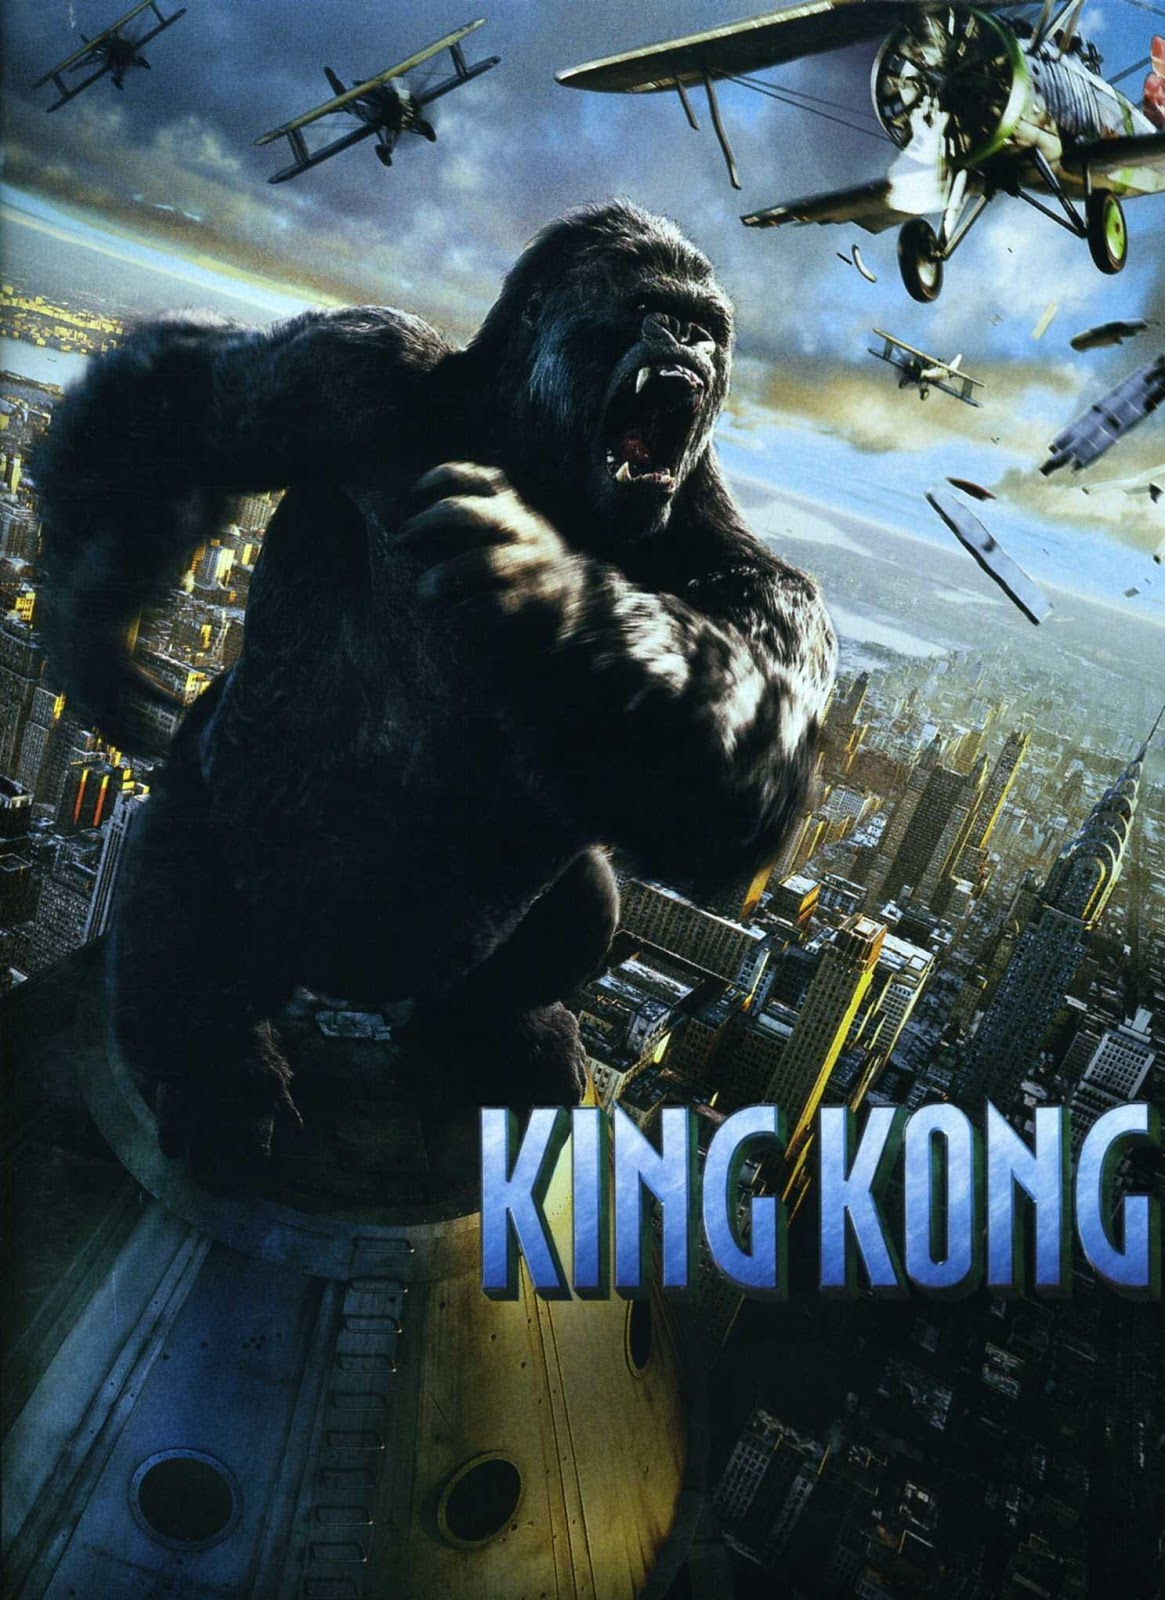 dessin king kong a imprimer gratuit